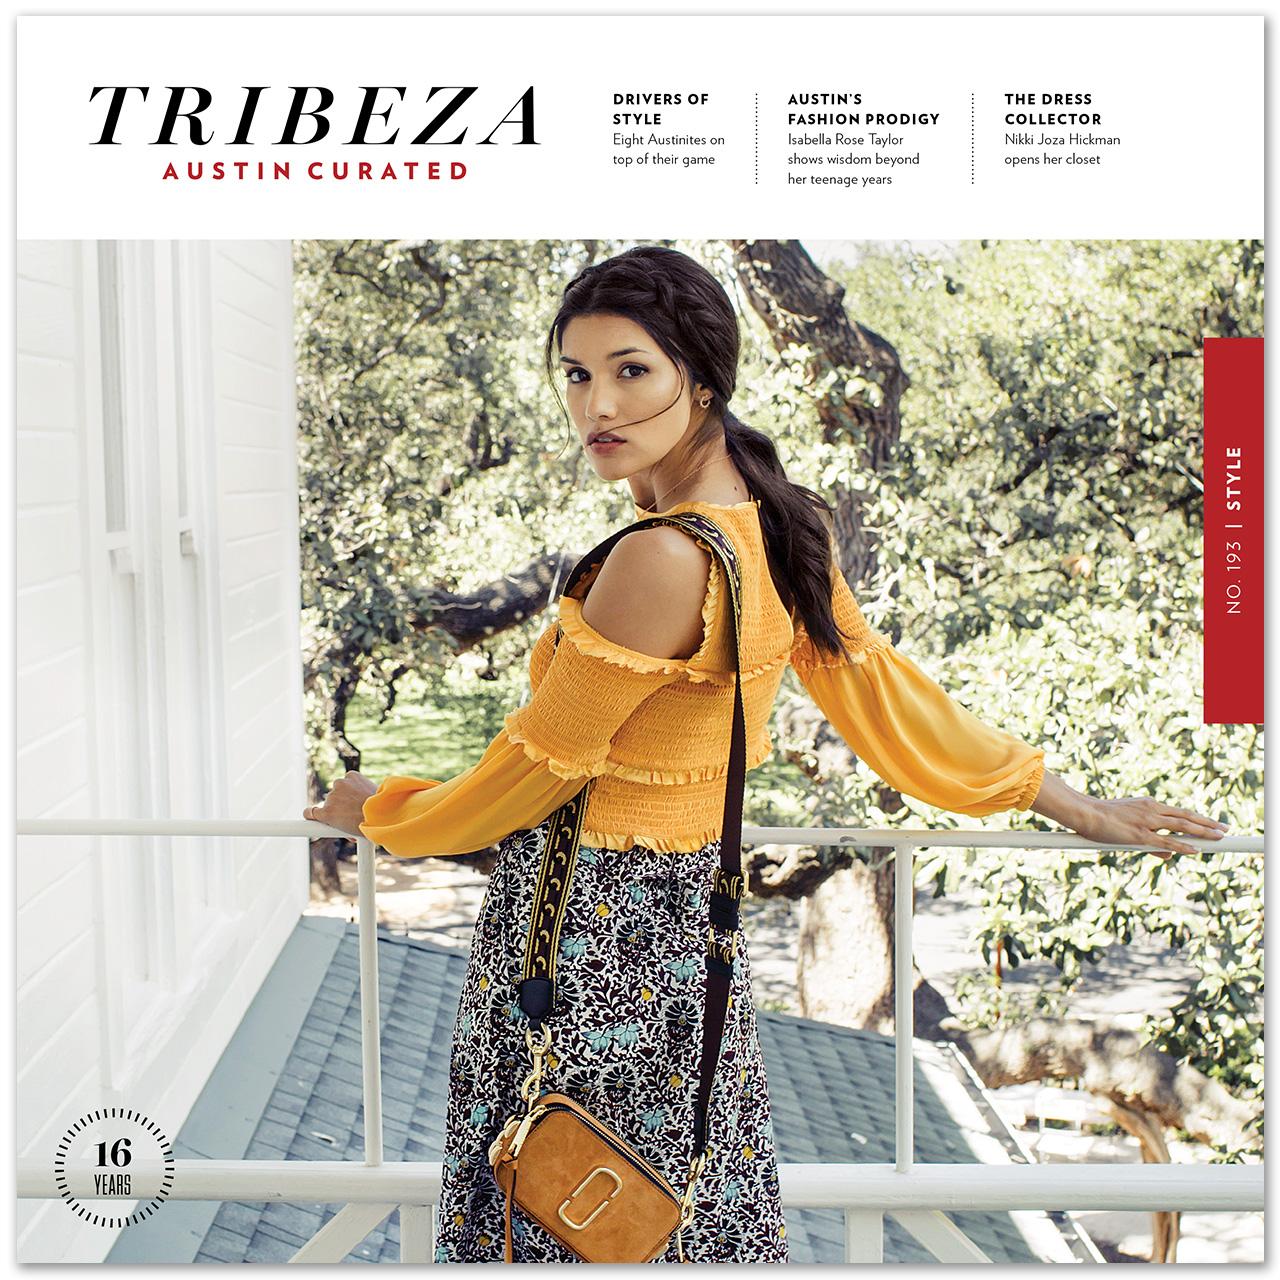 September 2017 Style Issue